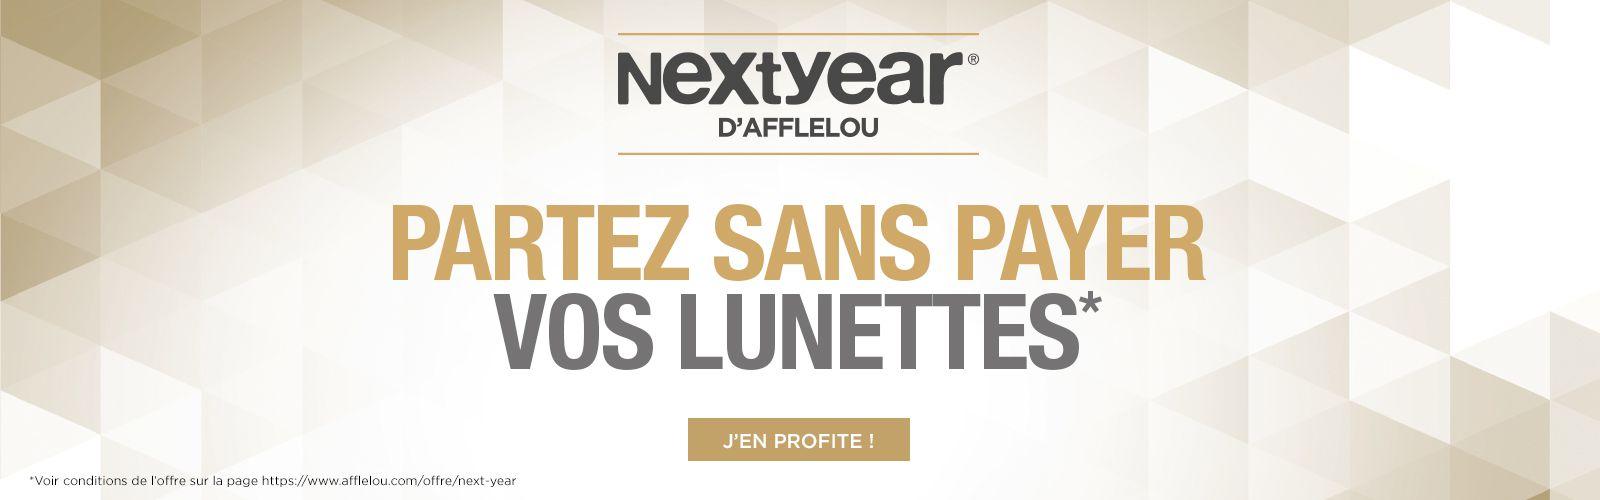 0454a152e1100 Opticien Alain Afflelou   Lunettes